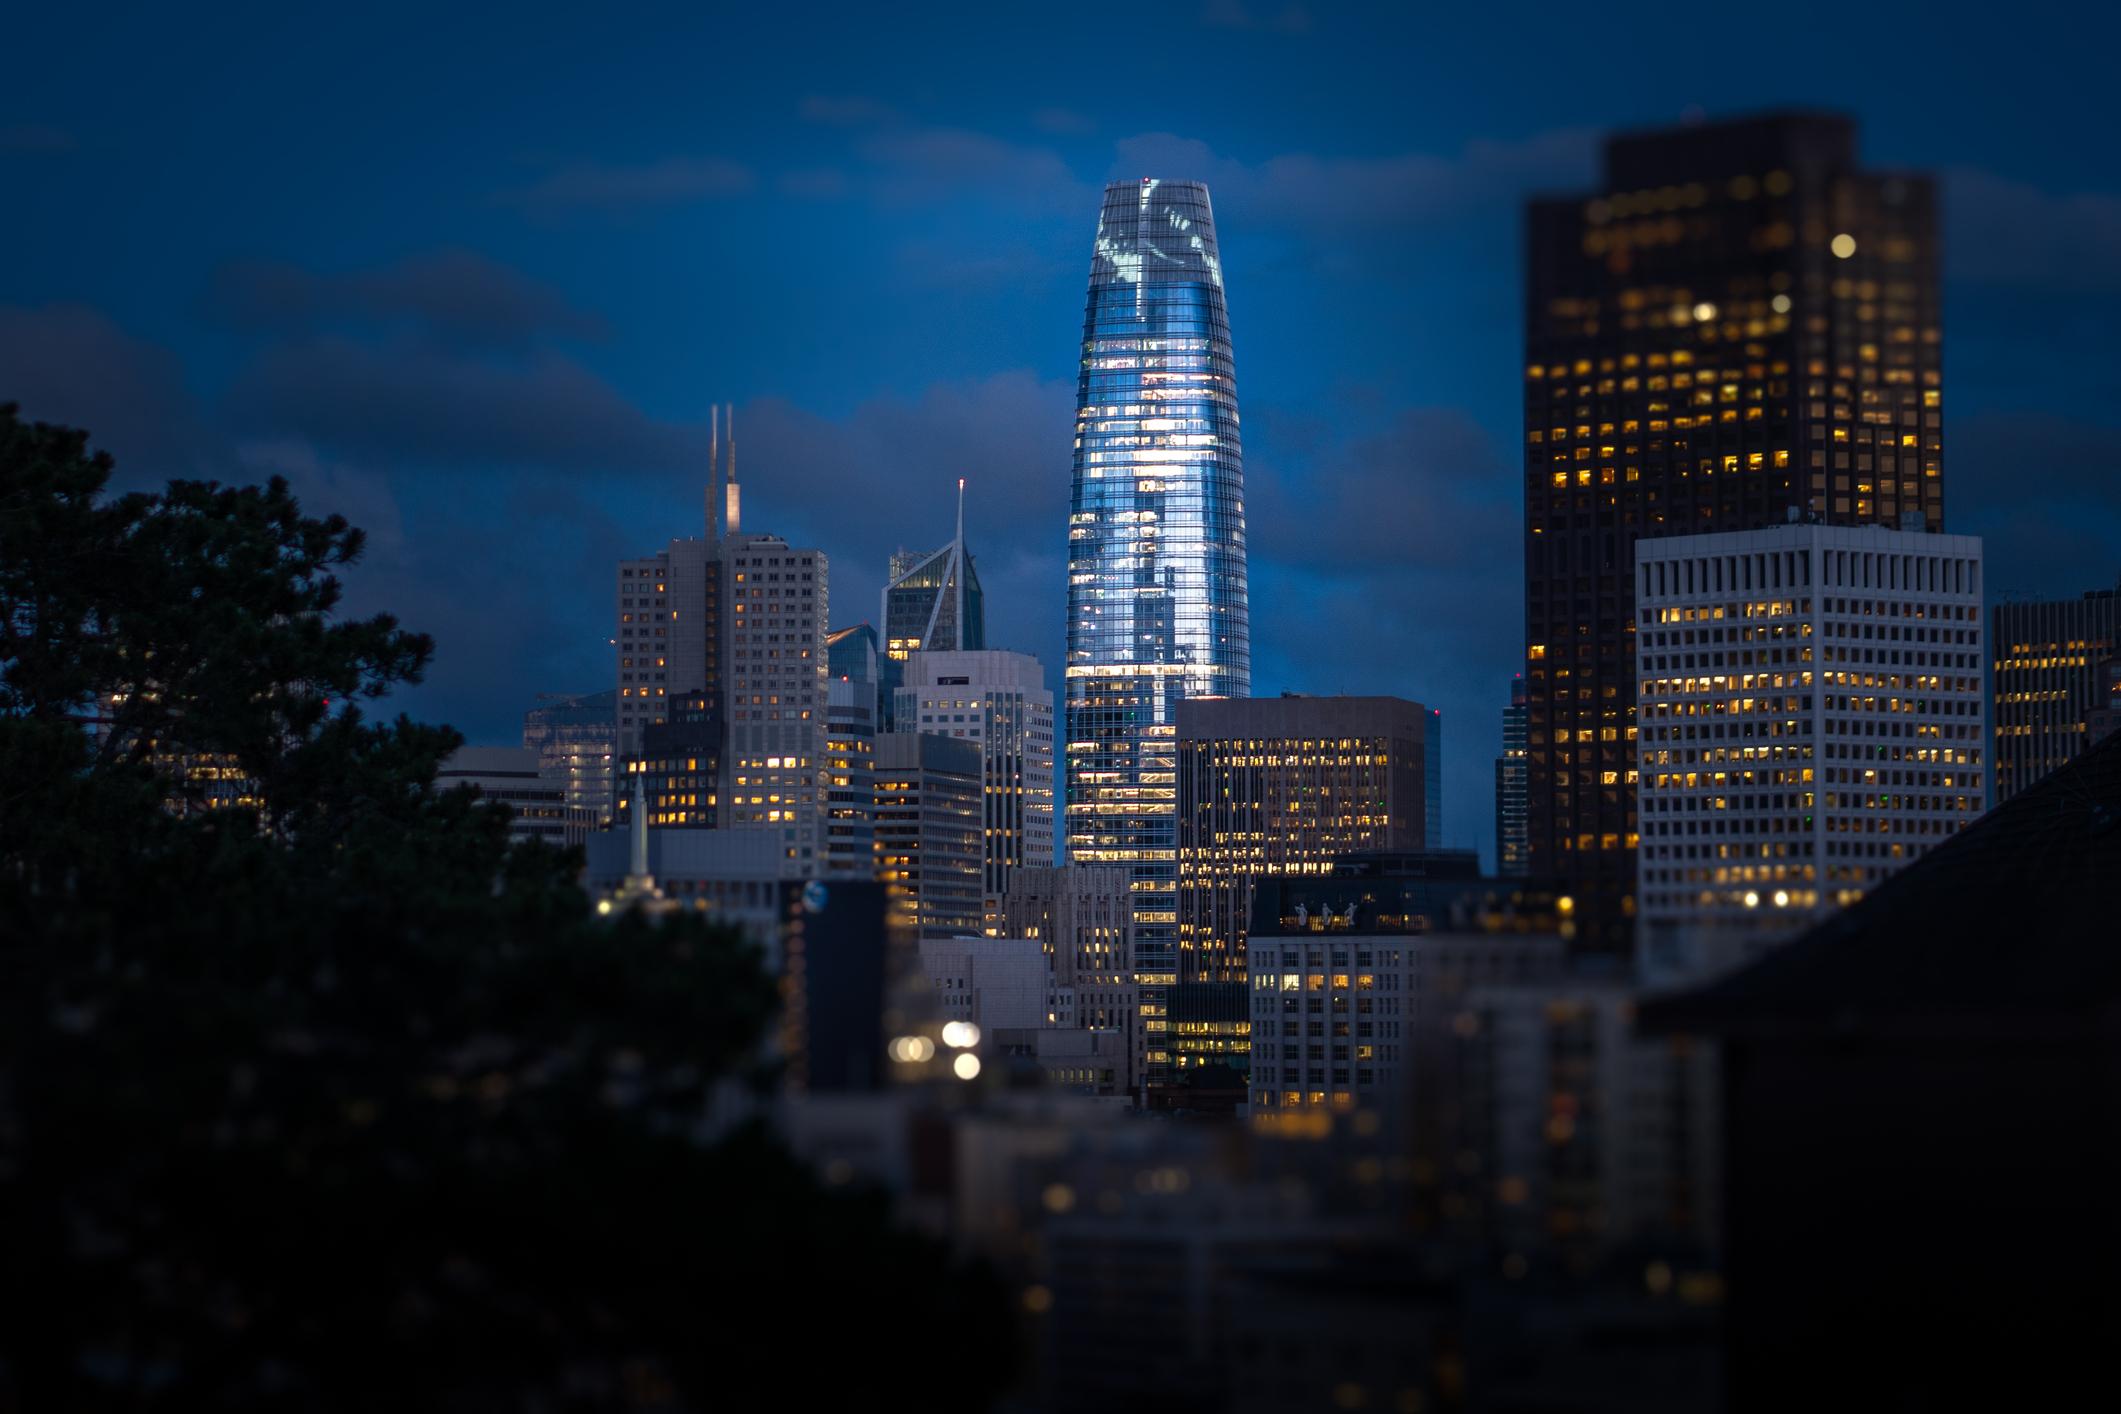 Salesforce TI – Salesforce Tower